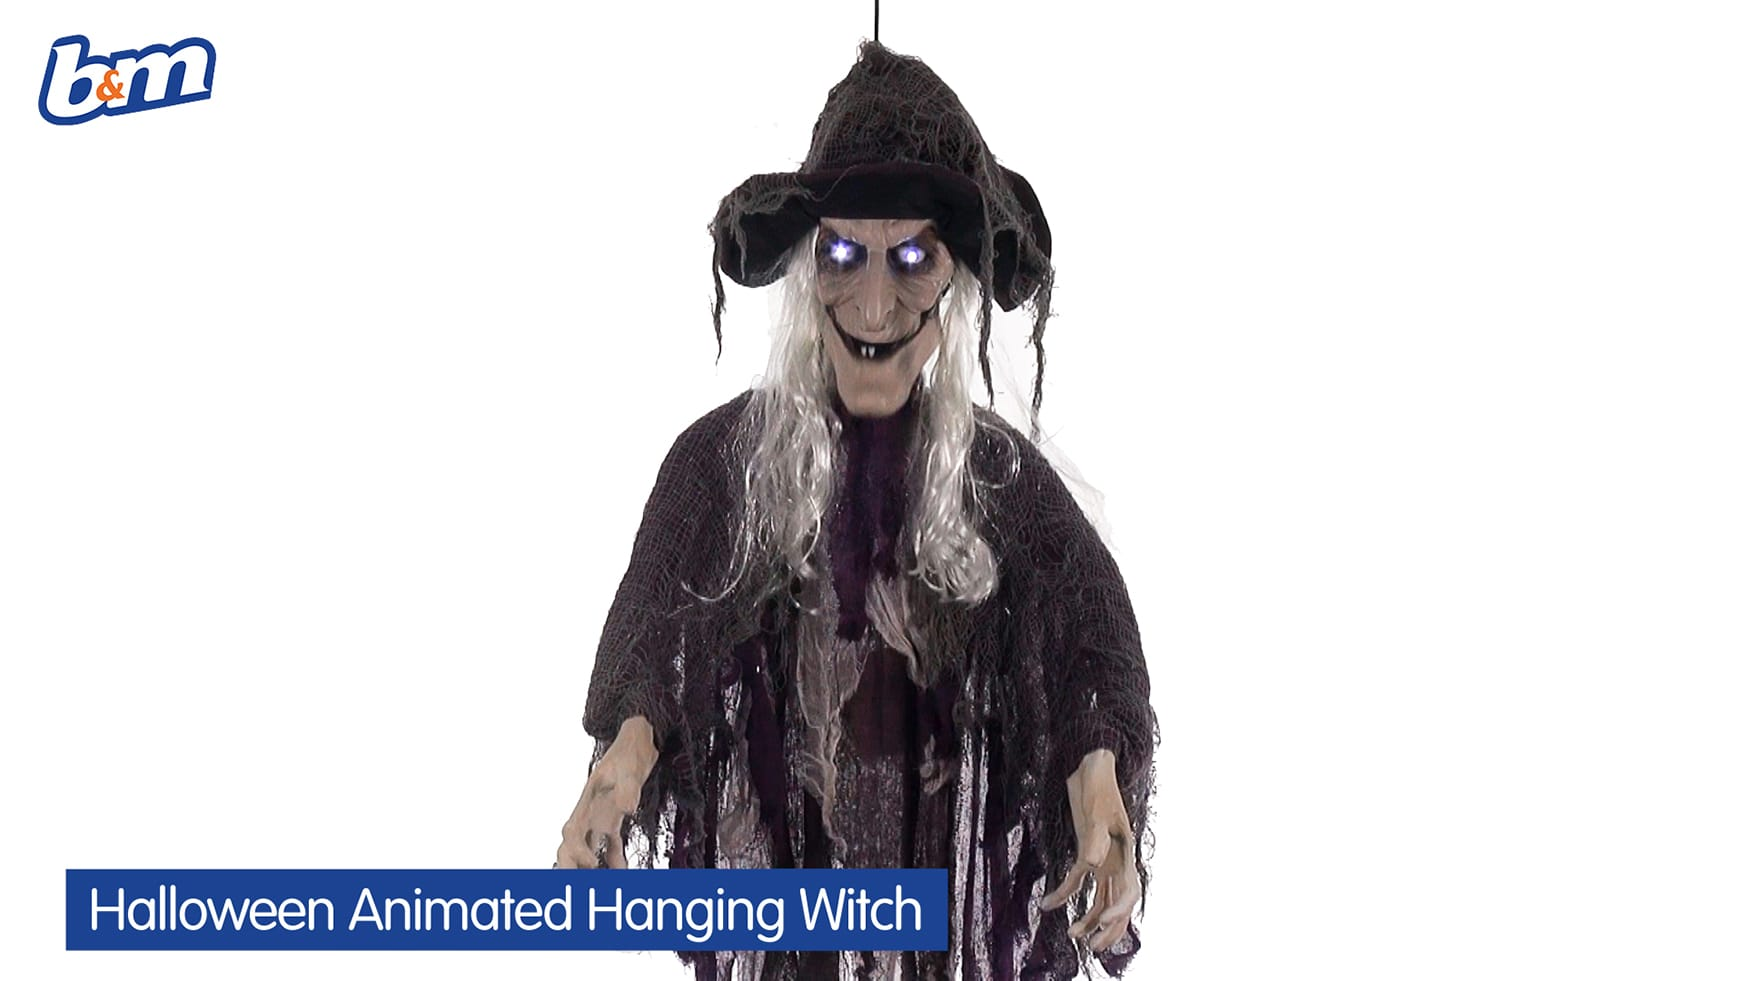 b&m lifestyle | animated talking hanging witch